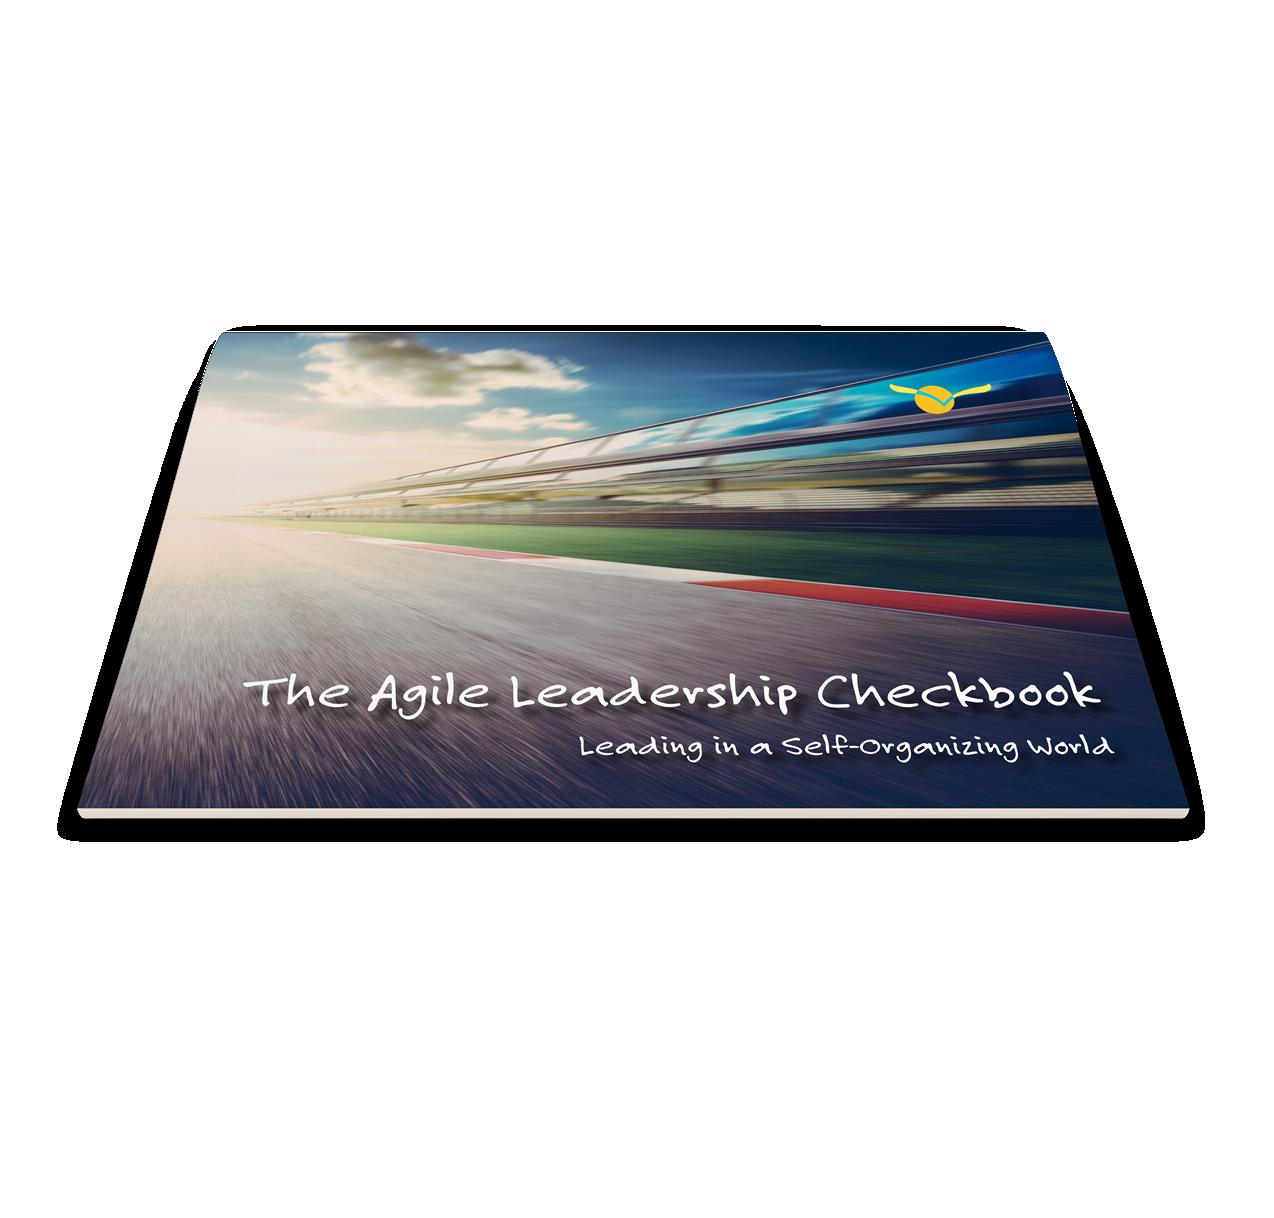 Agile Leadership Checkbook